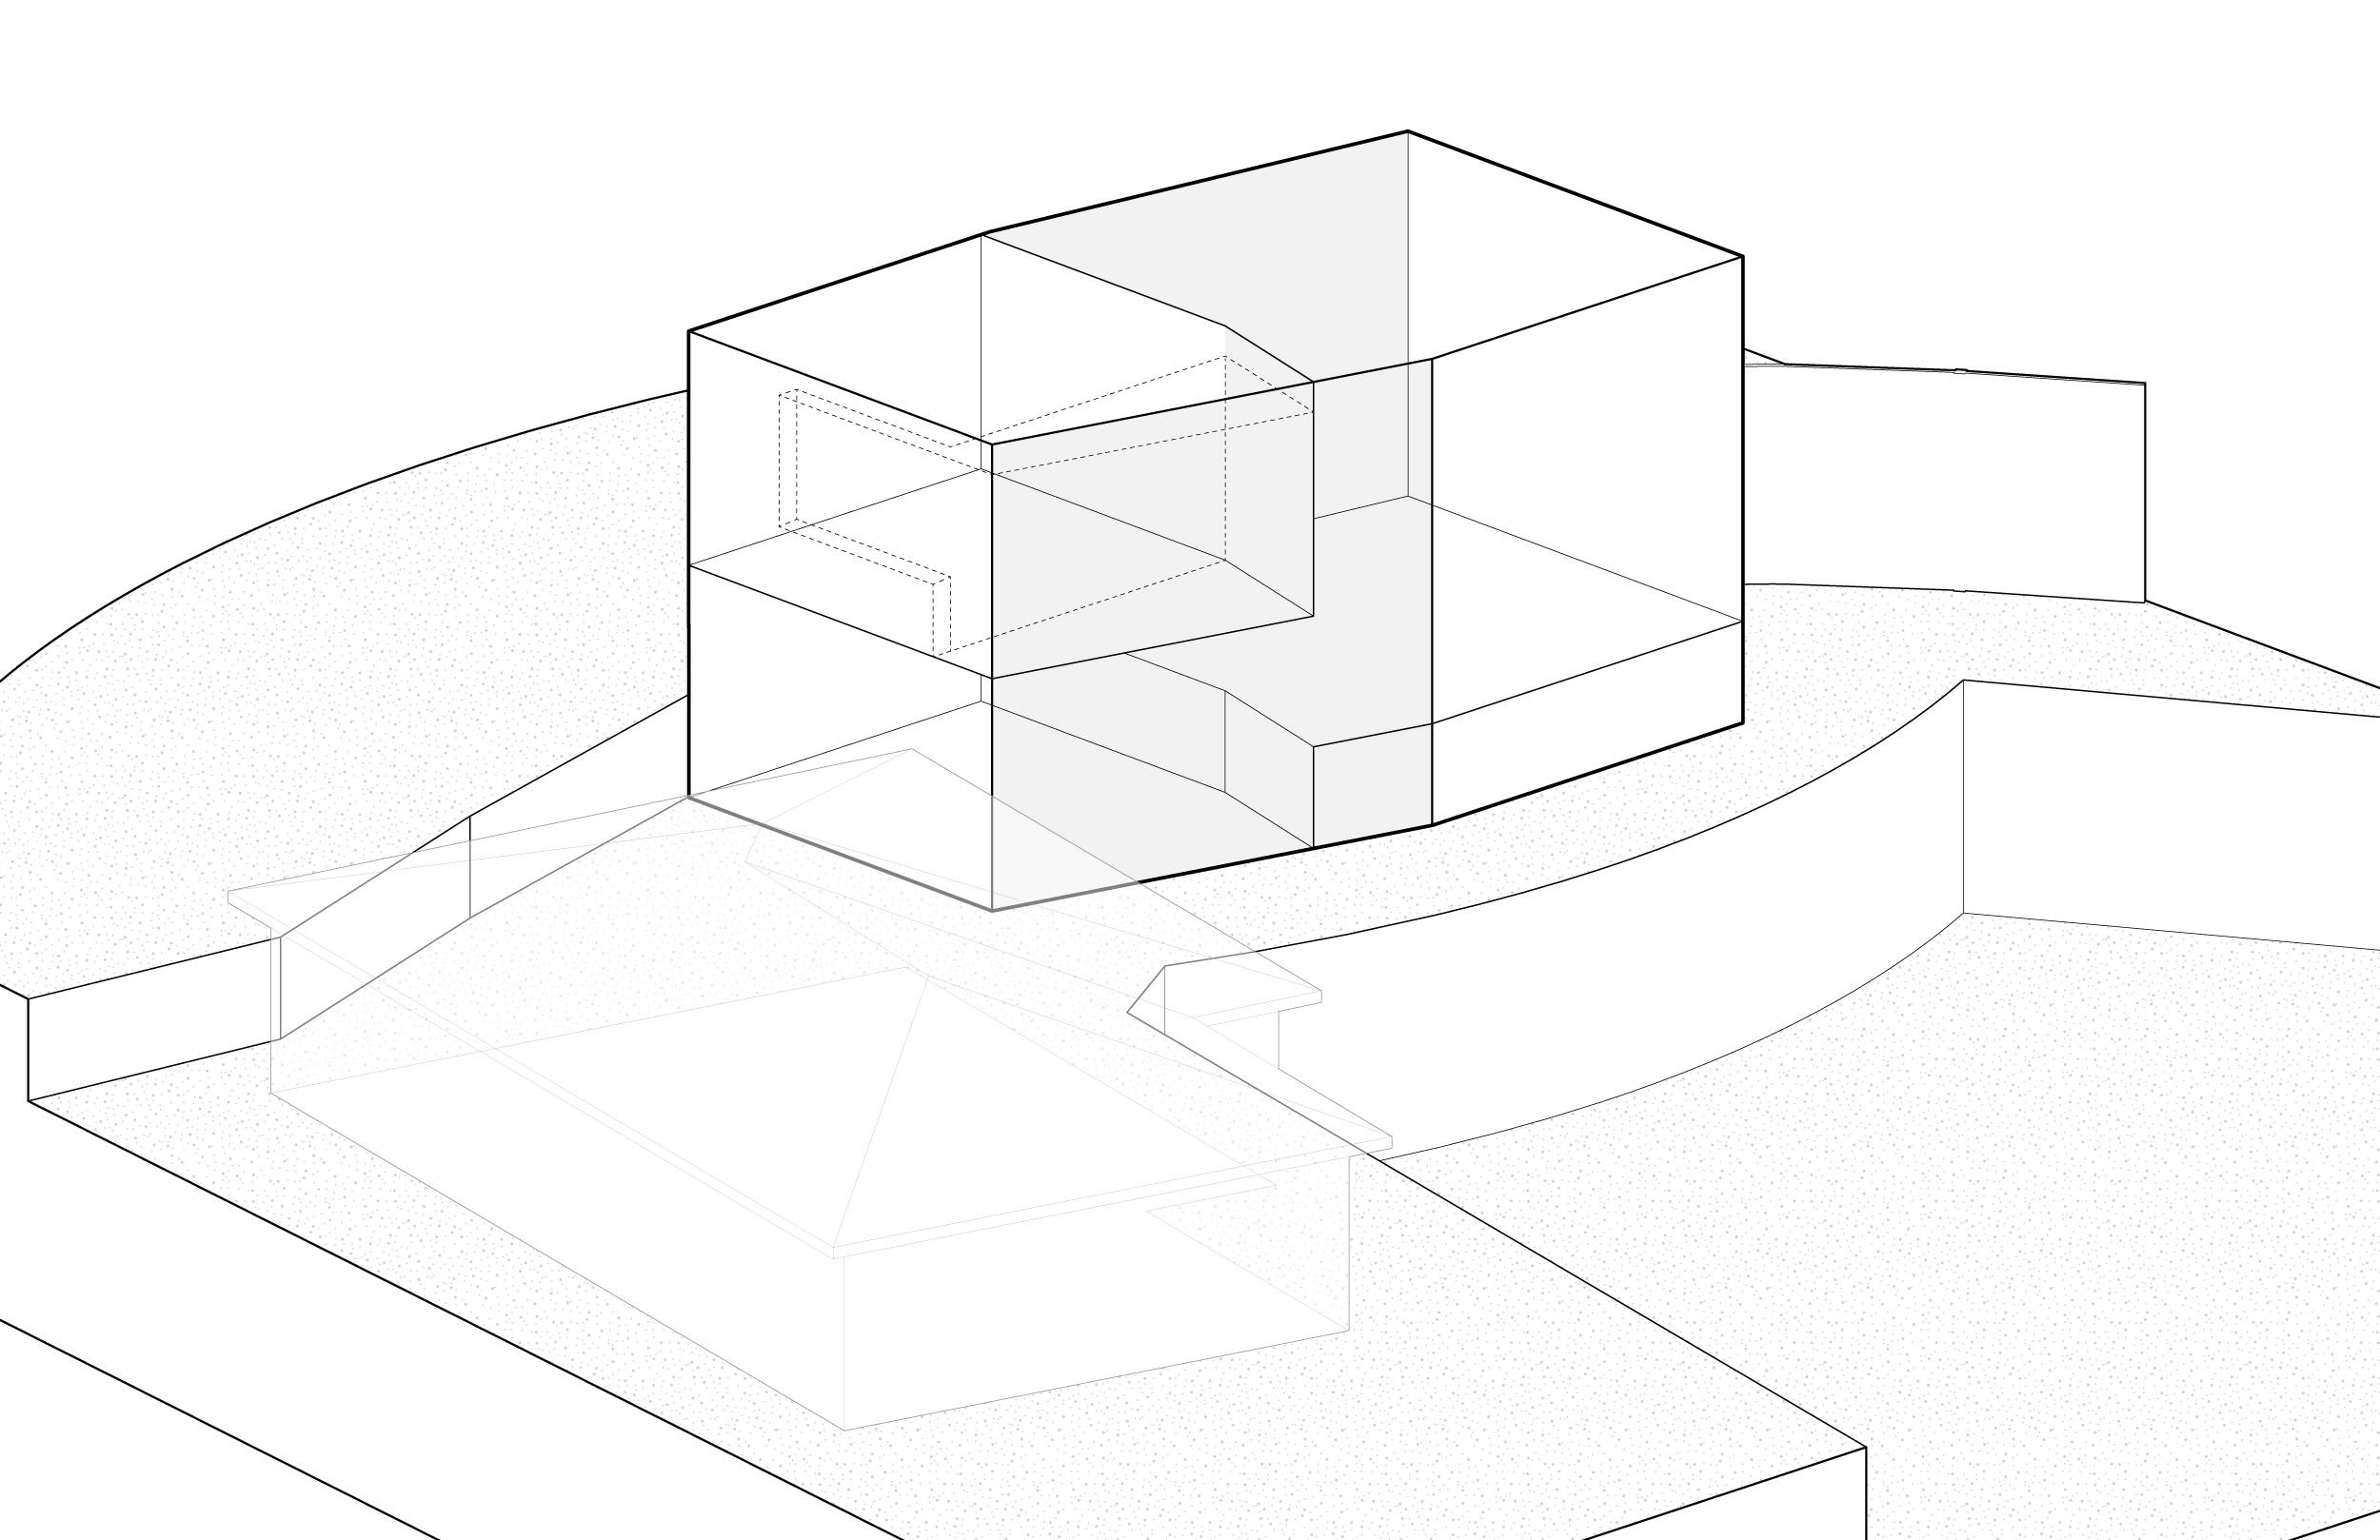 La-Cuesta-House_Diagram_04.jpg